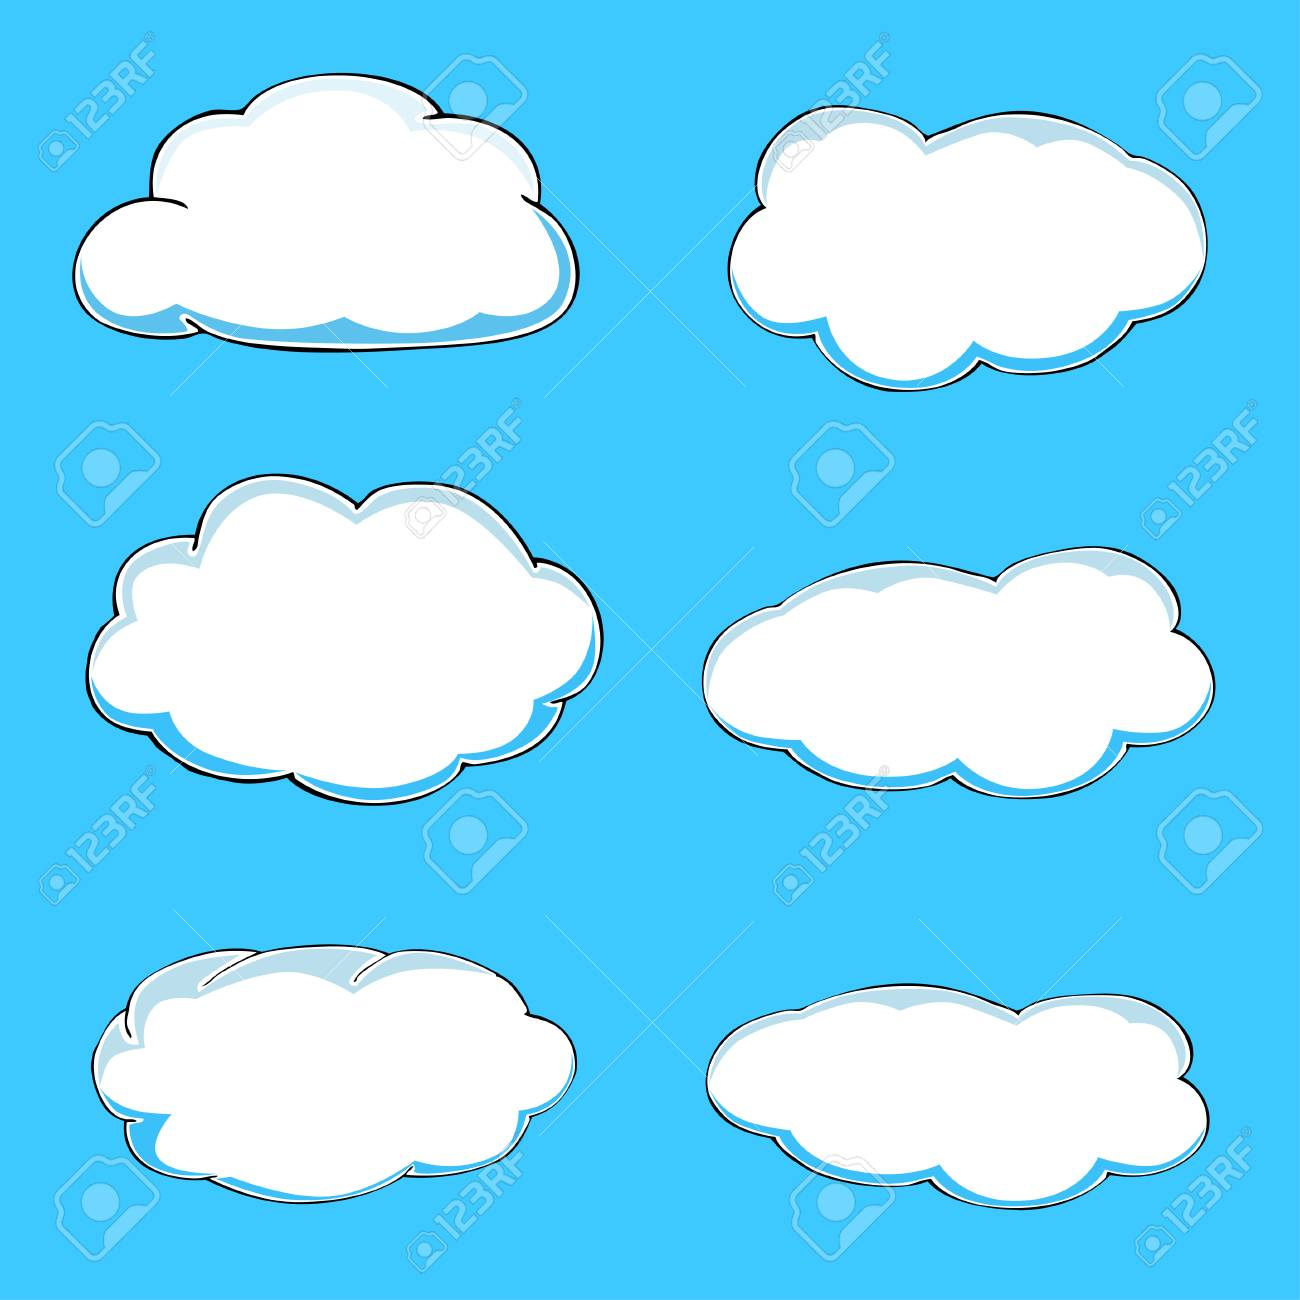 cartoon clouds illustration on blue background vector royalty free rh 123rf com cloud vector art cloud vector editor